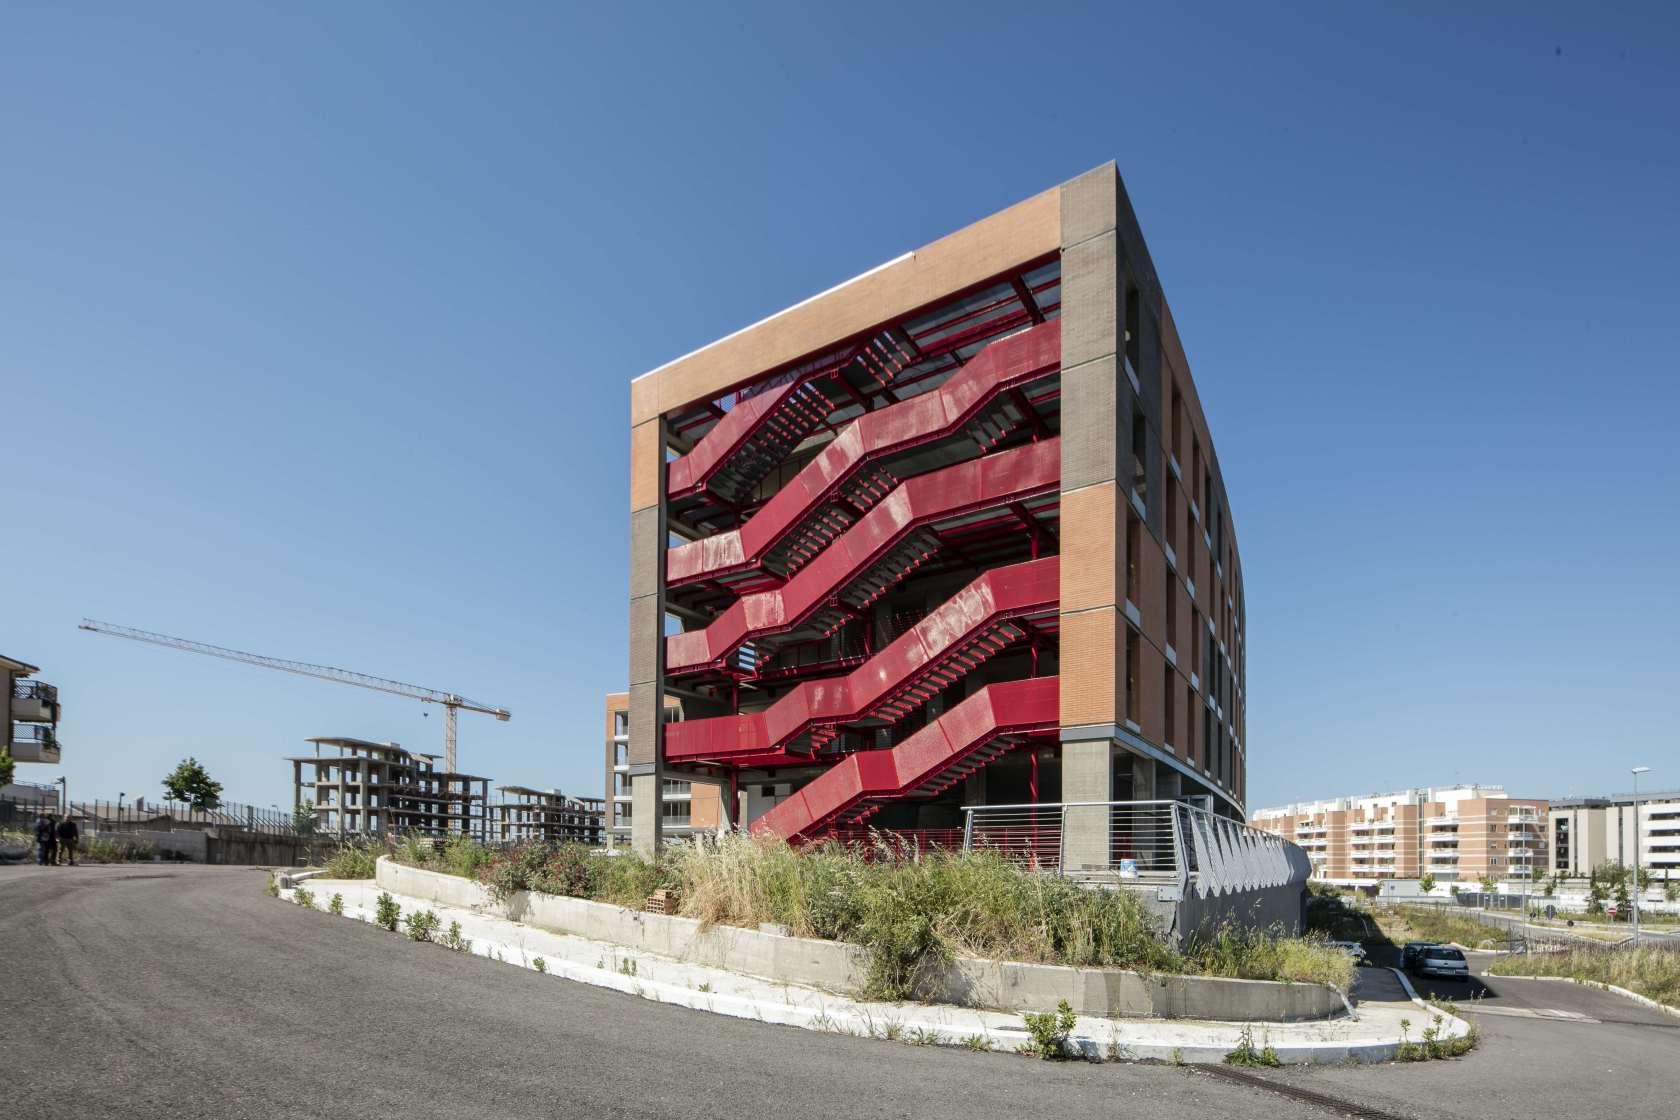 Hotel Marriott Renaissans - Architizer